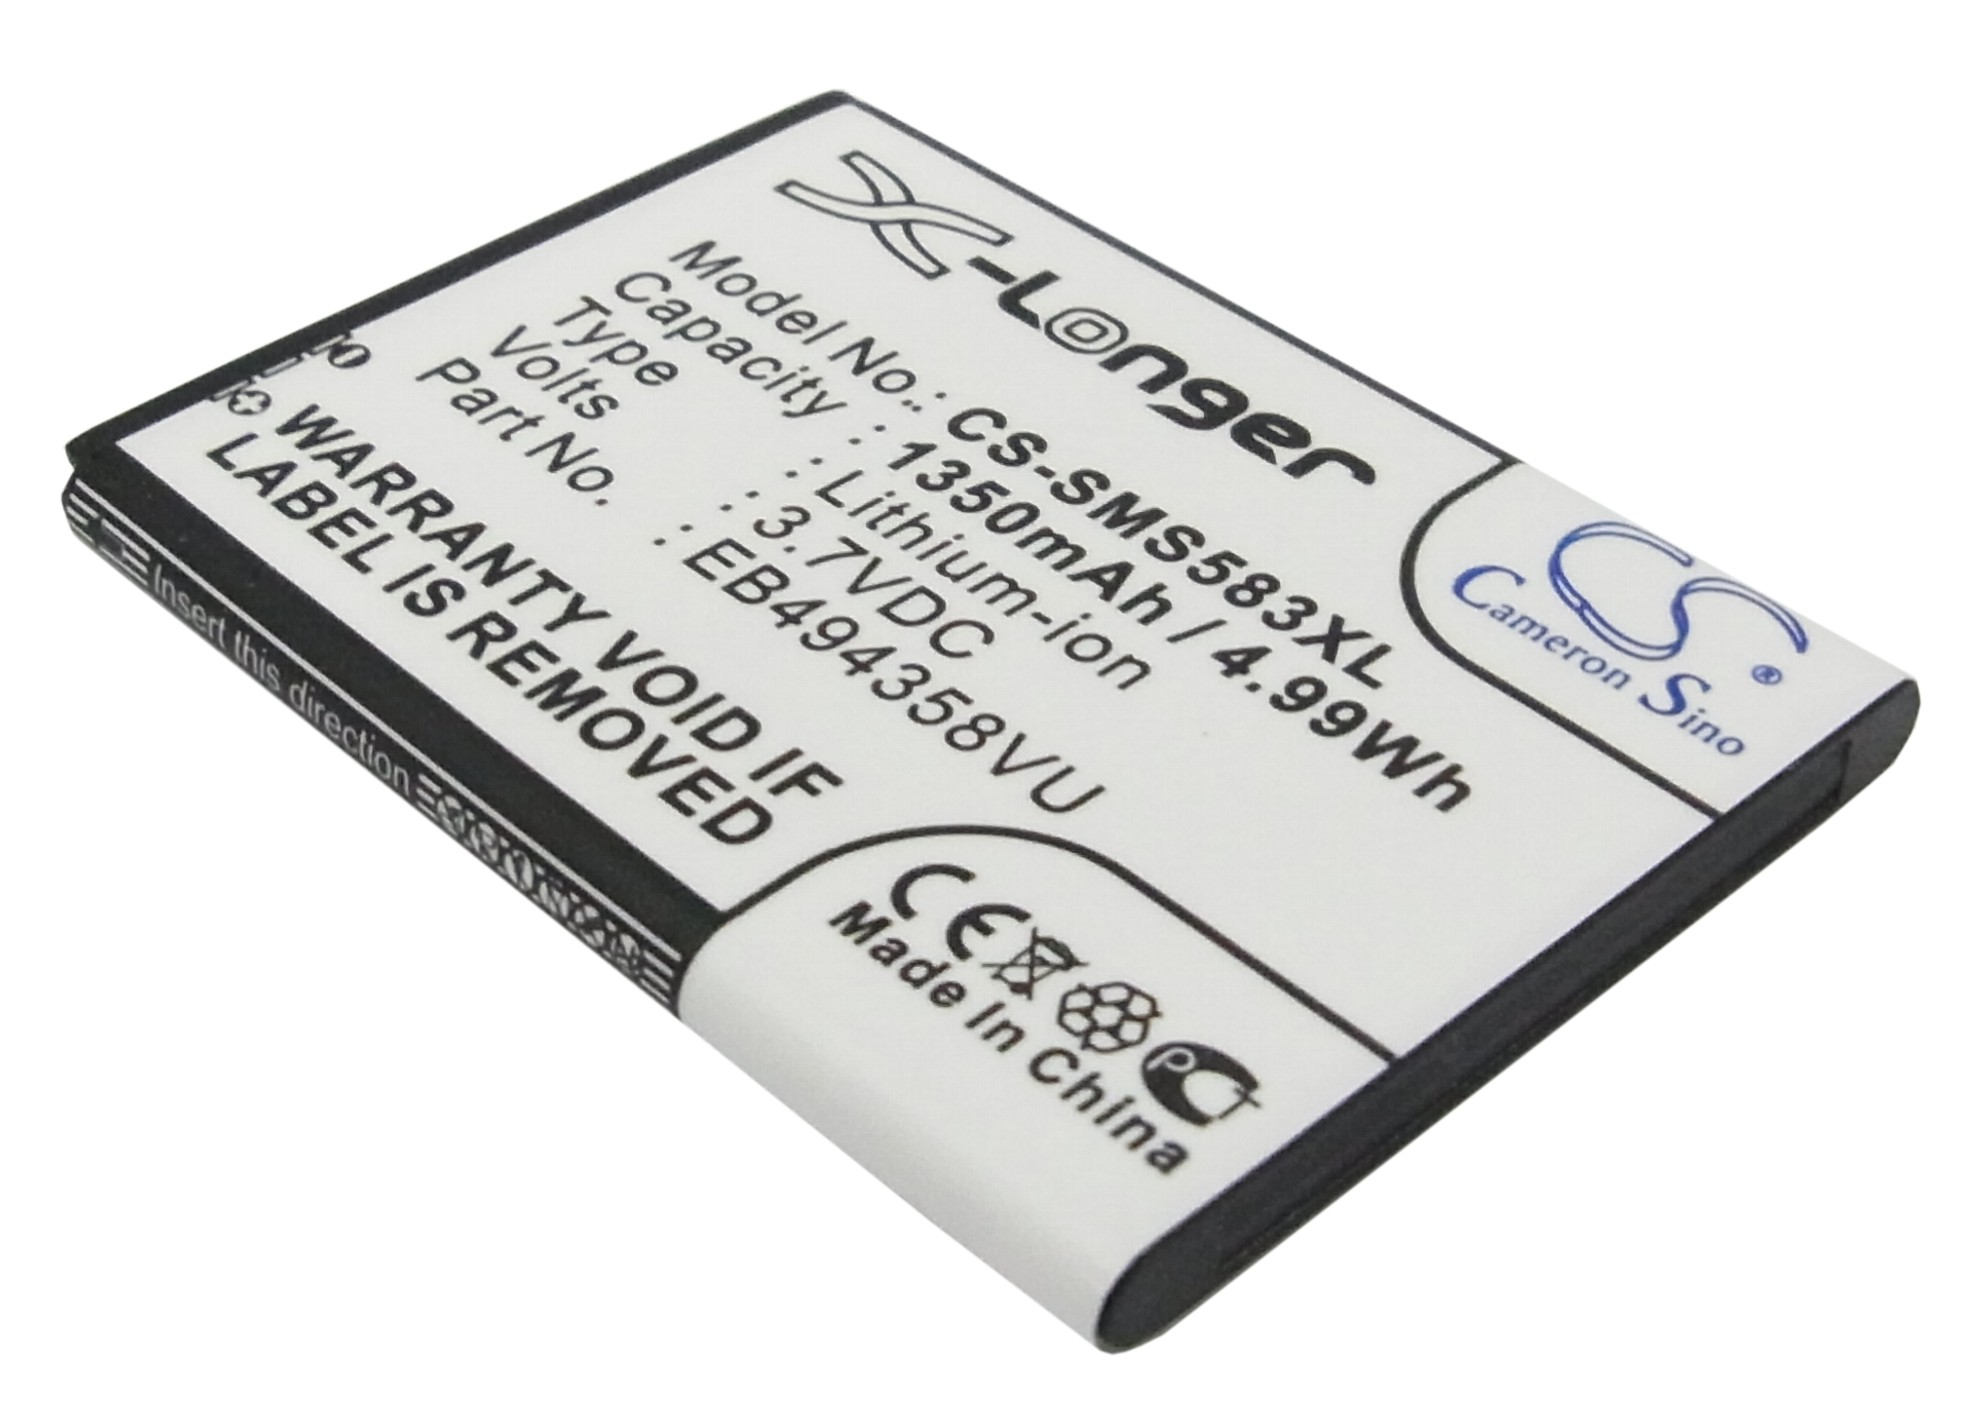 Cameron Sino baterie do mobilů pro SAMSUNG GT-S5660 3.7V Li-ion 1350mAh černá - neoriginální